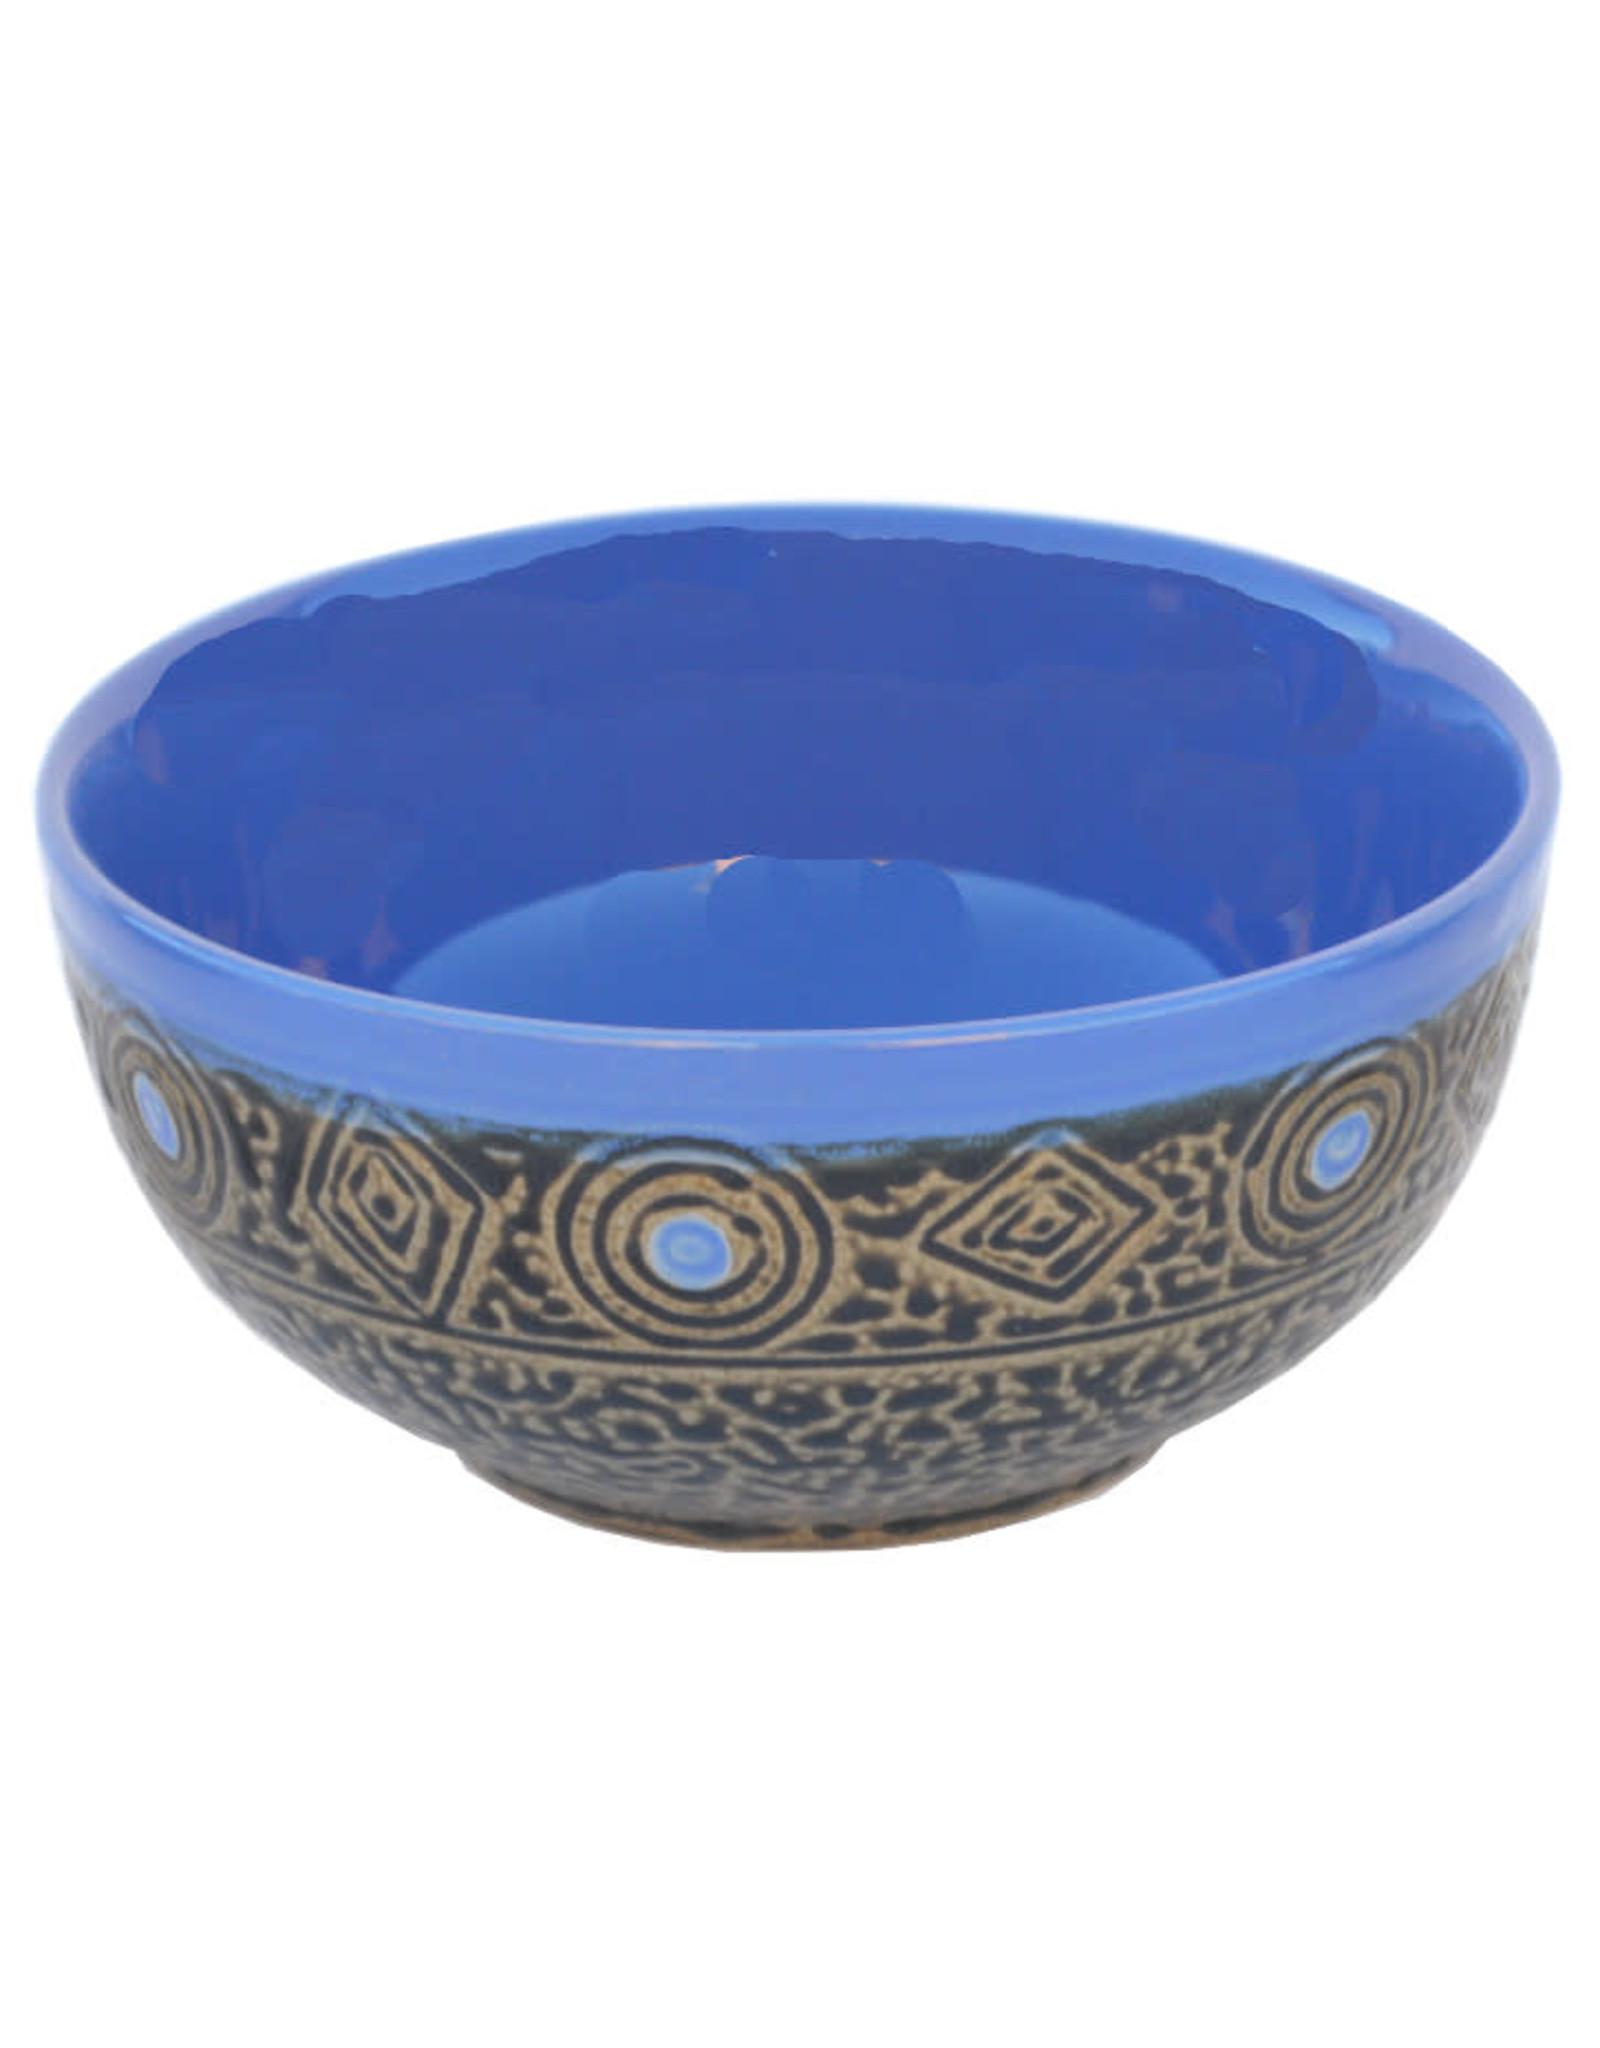 Always Azul SOUTHWEST CHILI SOUP BOWL (15OZ)